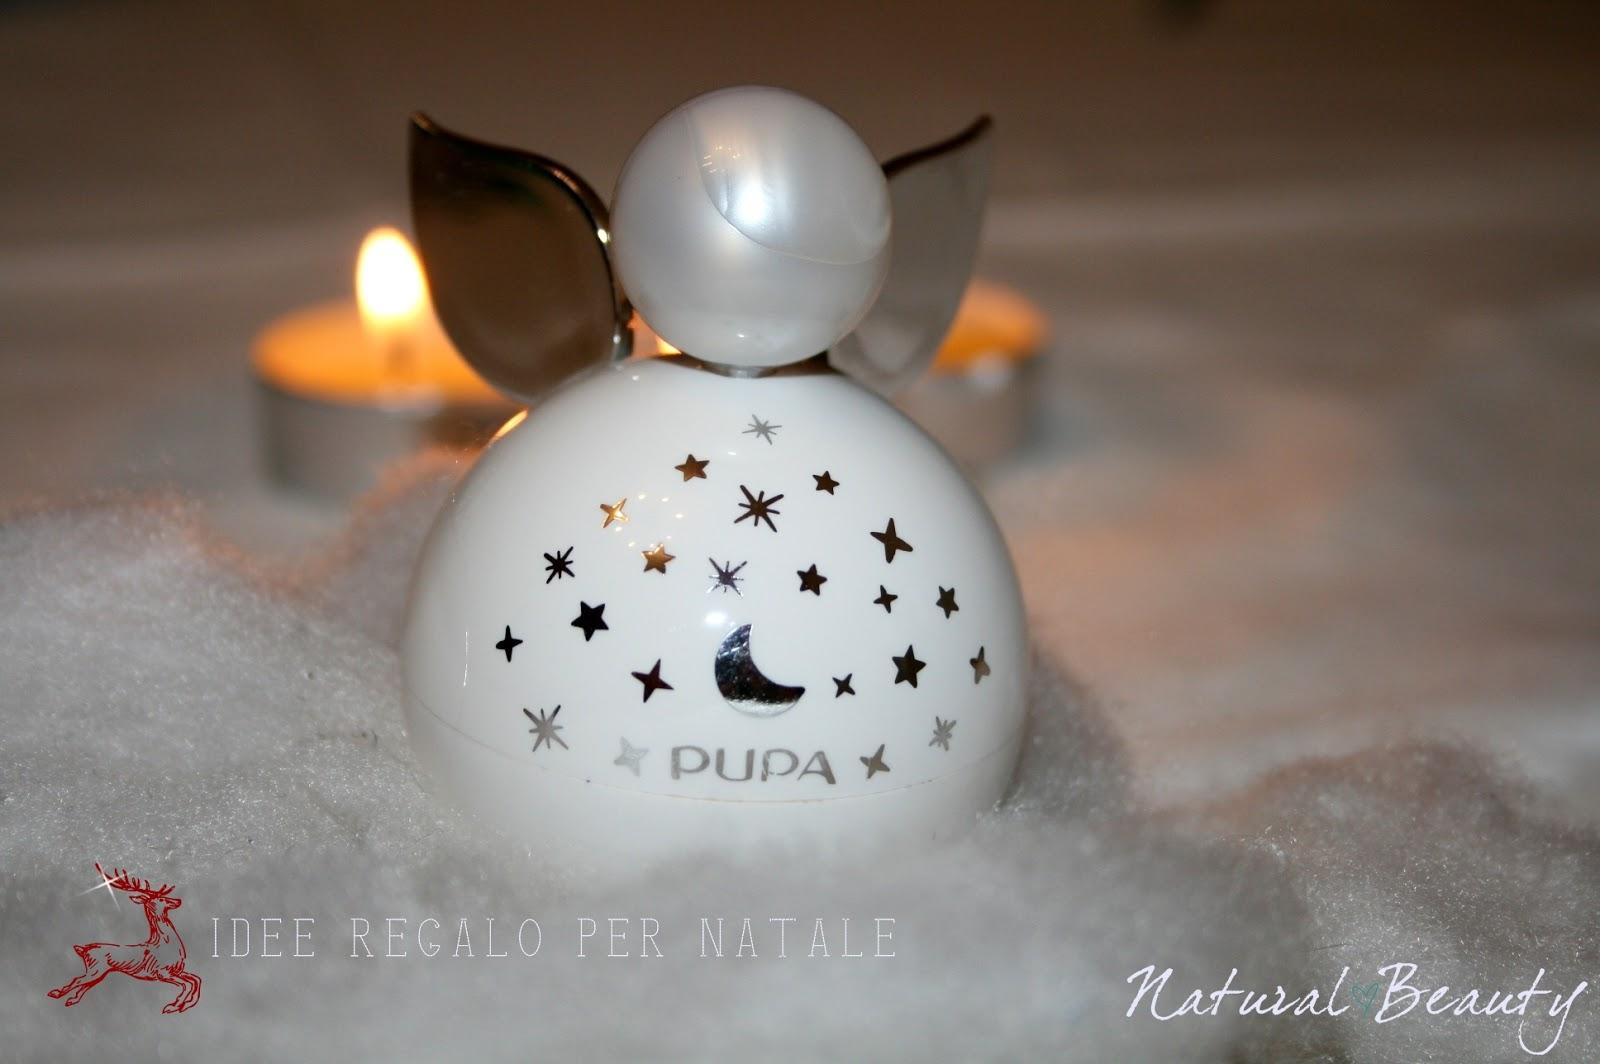 Natural beauty idea regalo per natale pupa angel for Idea per regalo